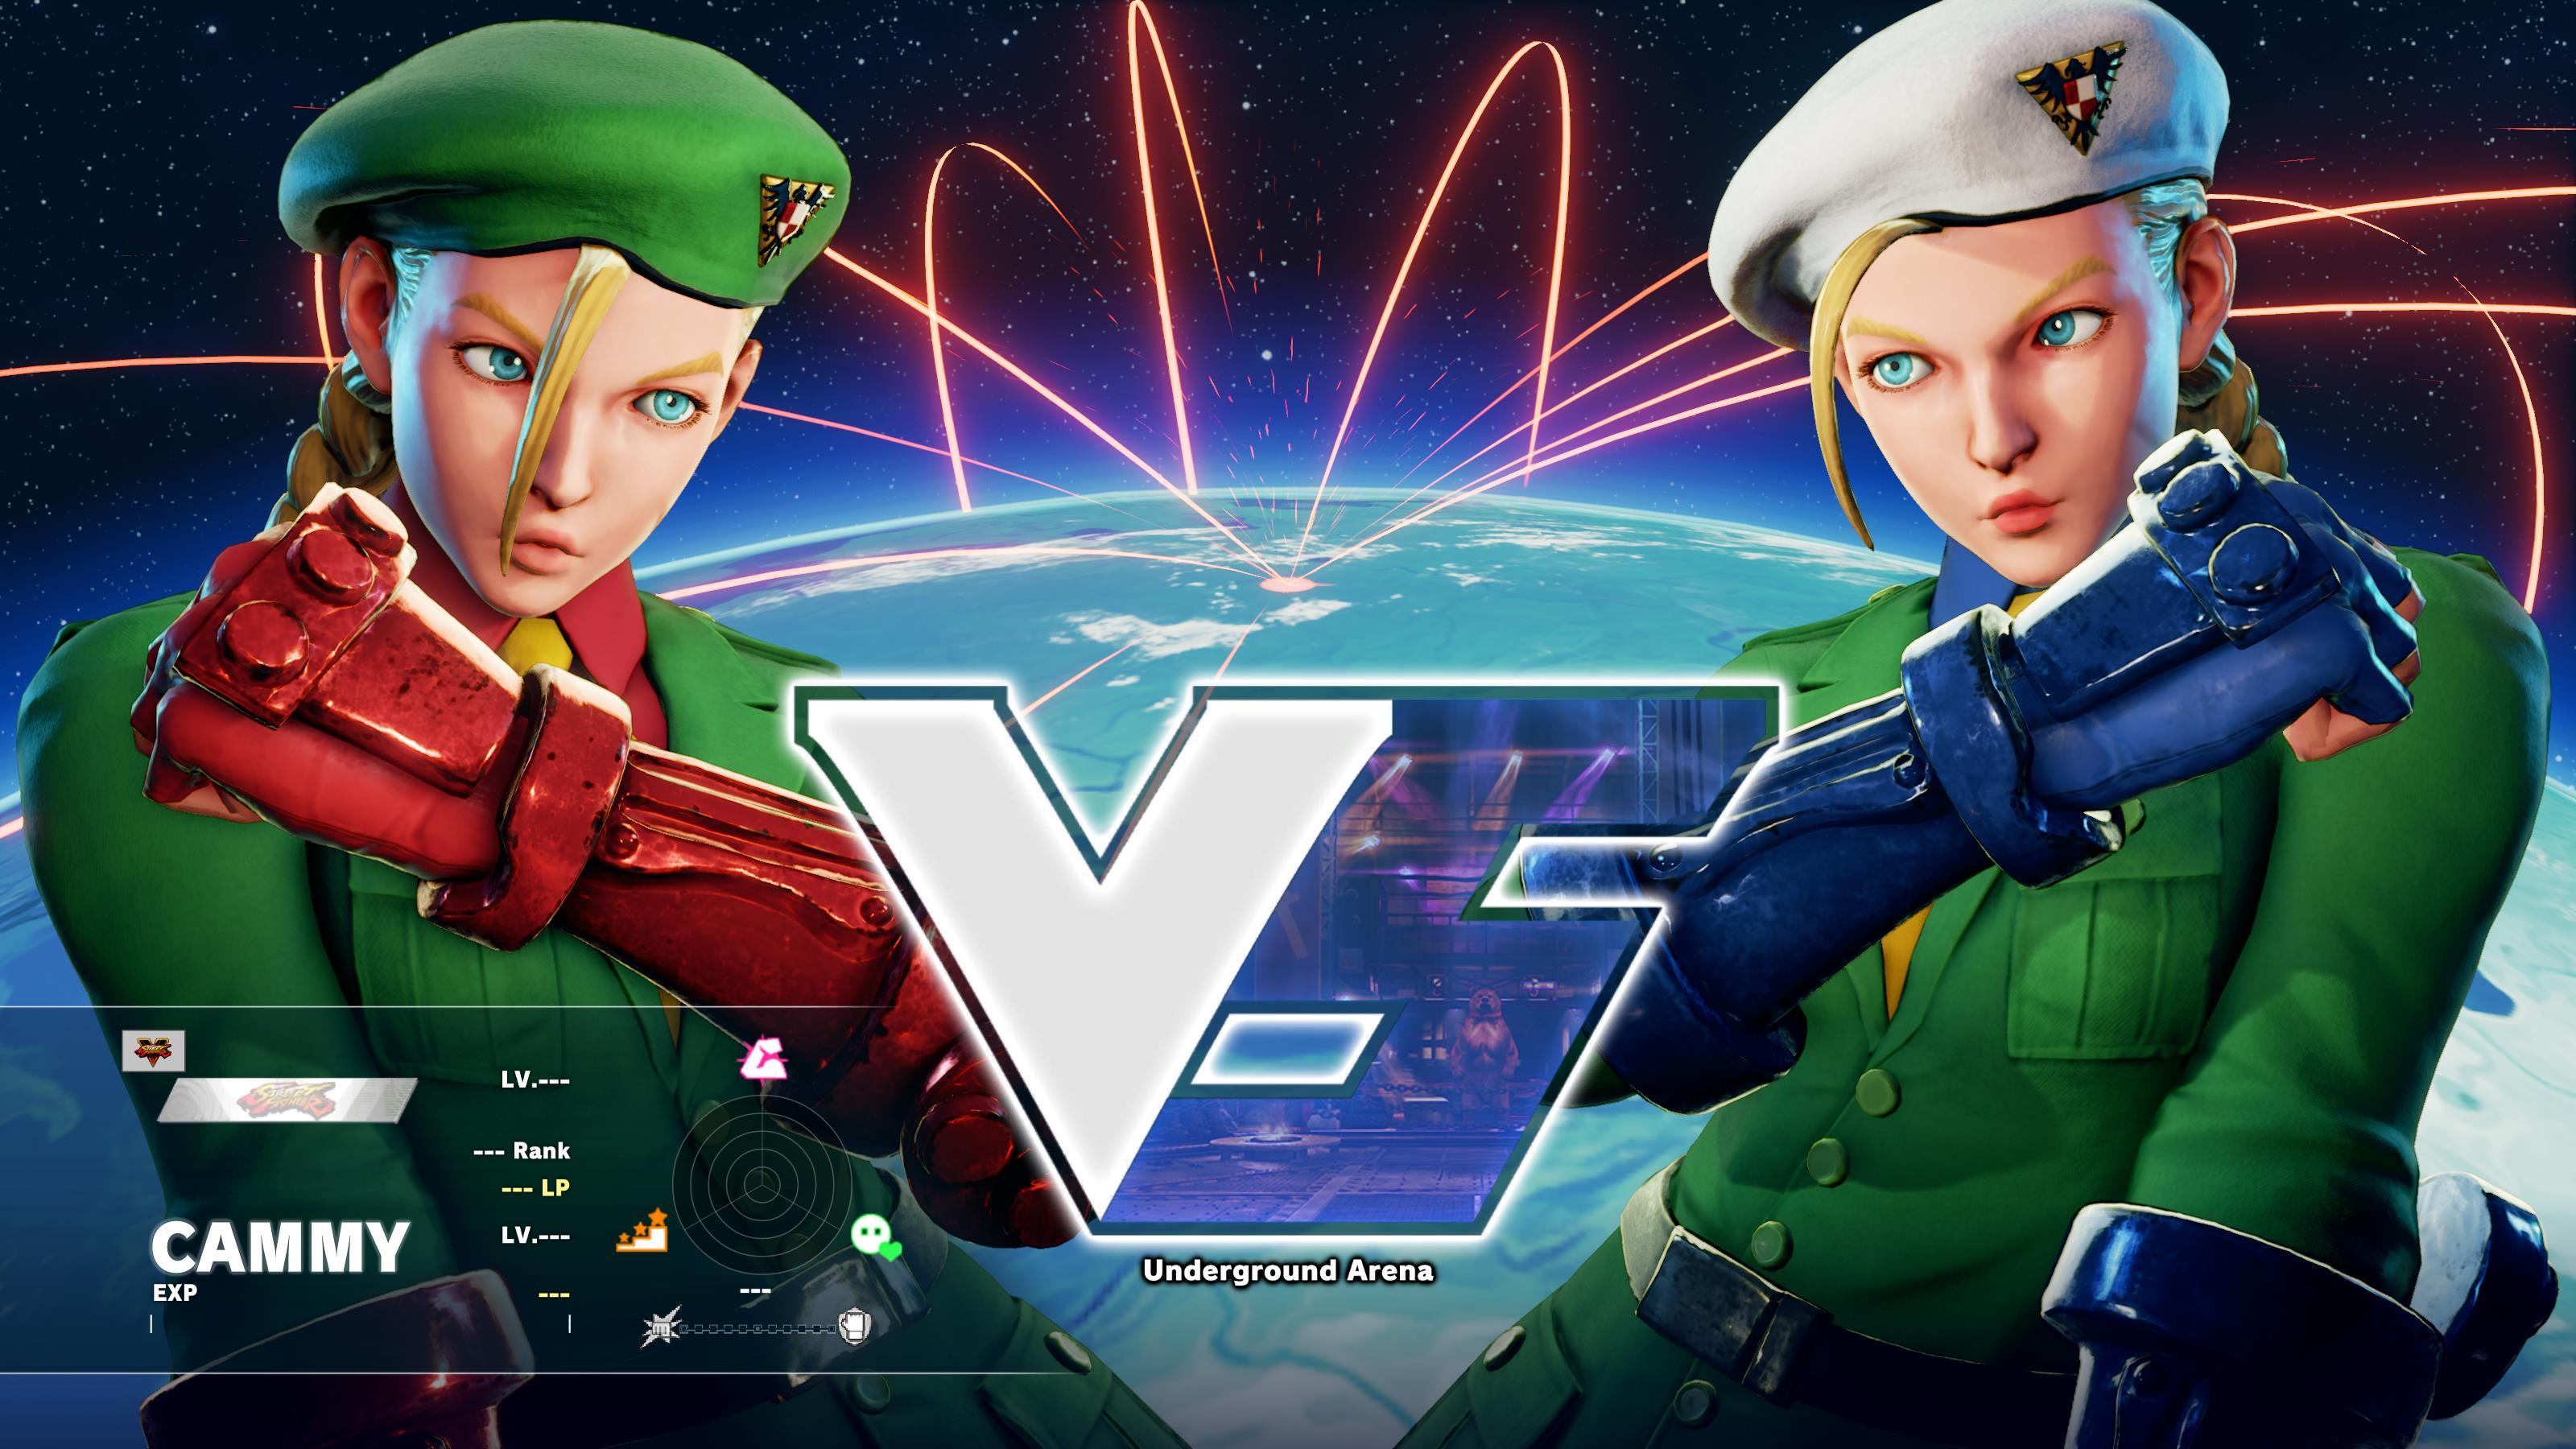 Street Fighter 5 Beta Update Reveals Multiple Alternate